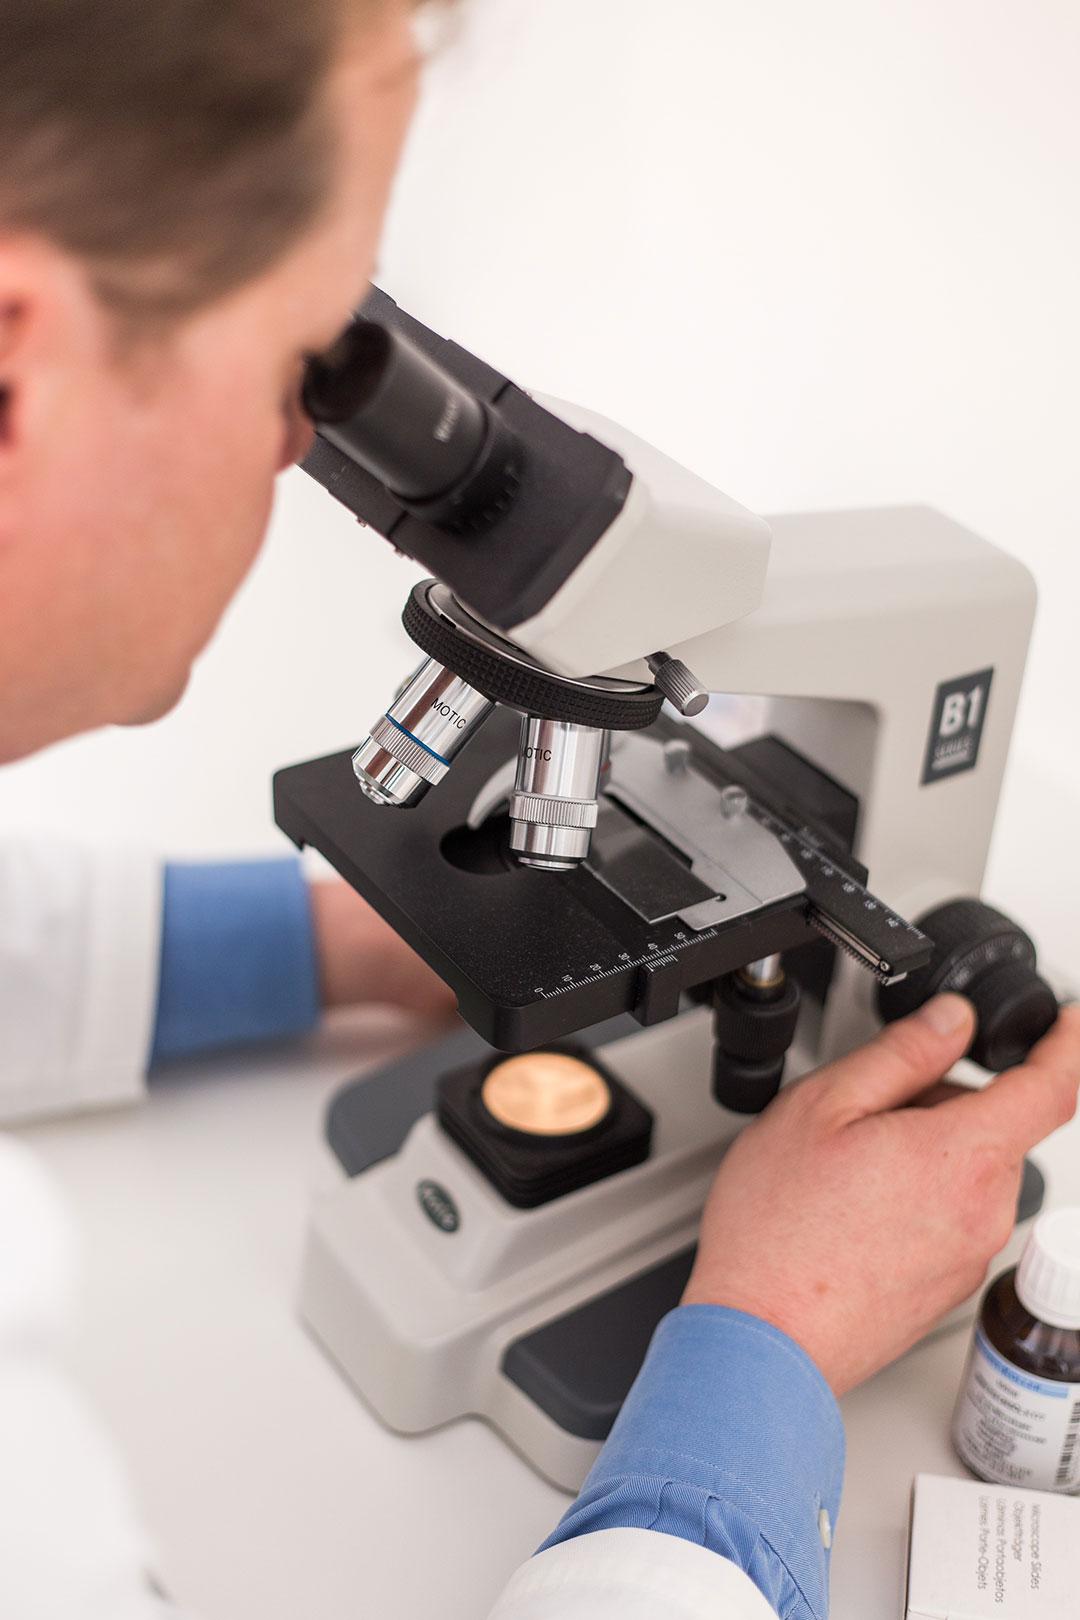 Untersuchung am Mikroskop